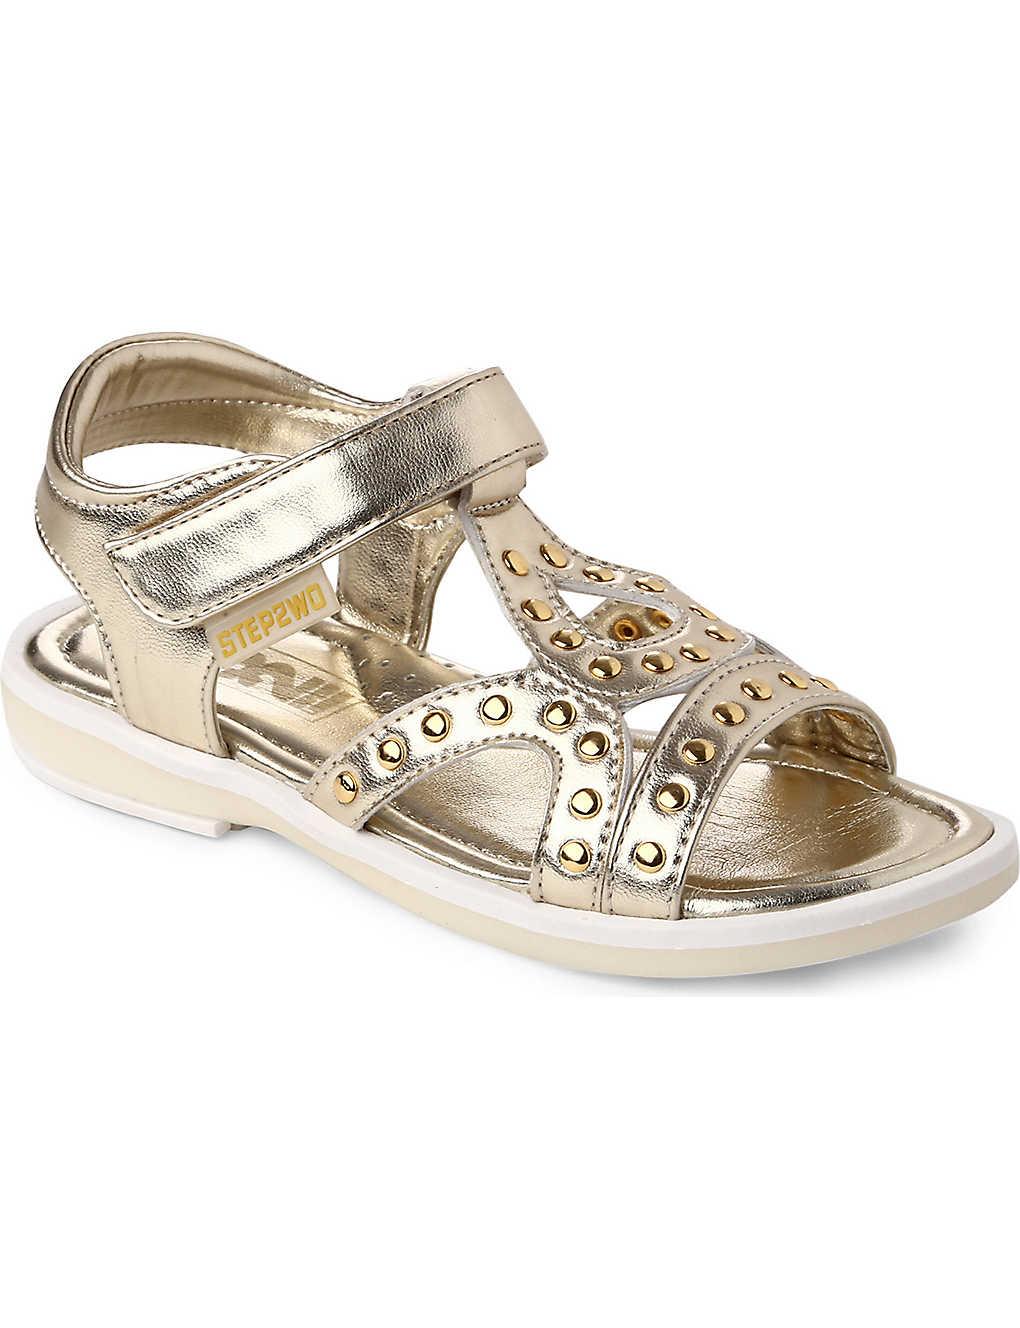 8b20b8b3cdc3 STEP2WO - Jackie gladiator sandals 4-8 years